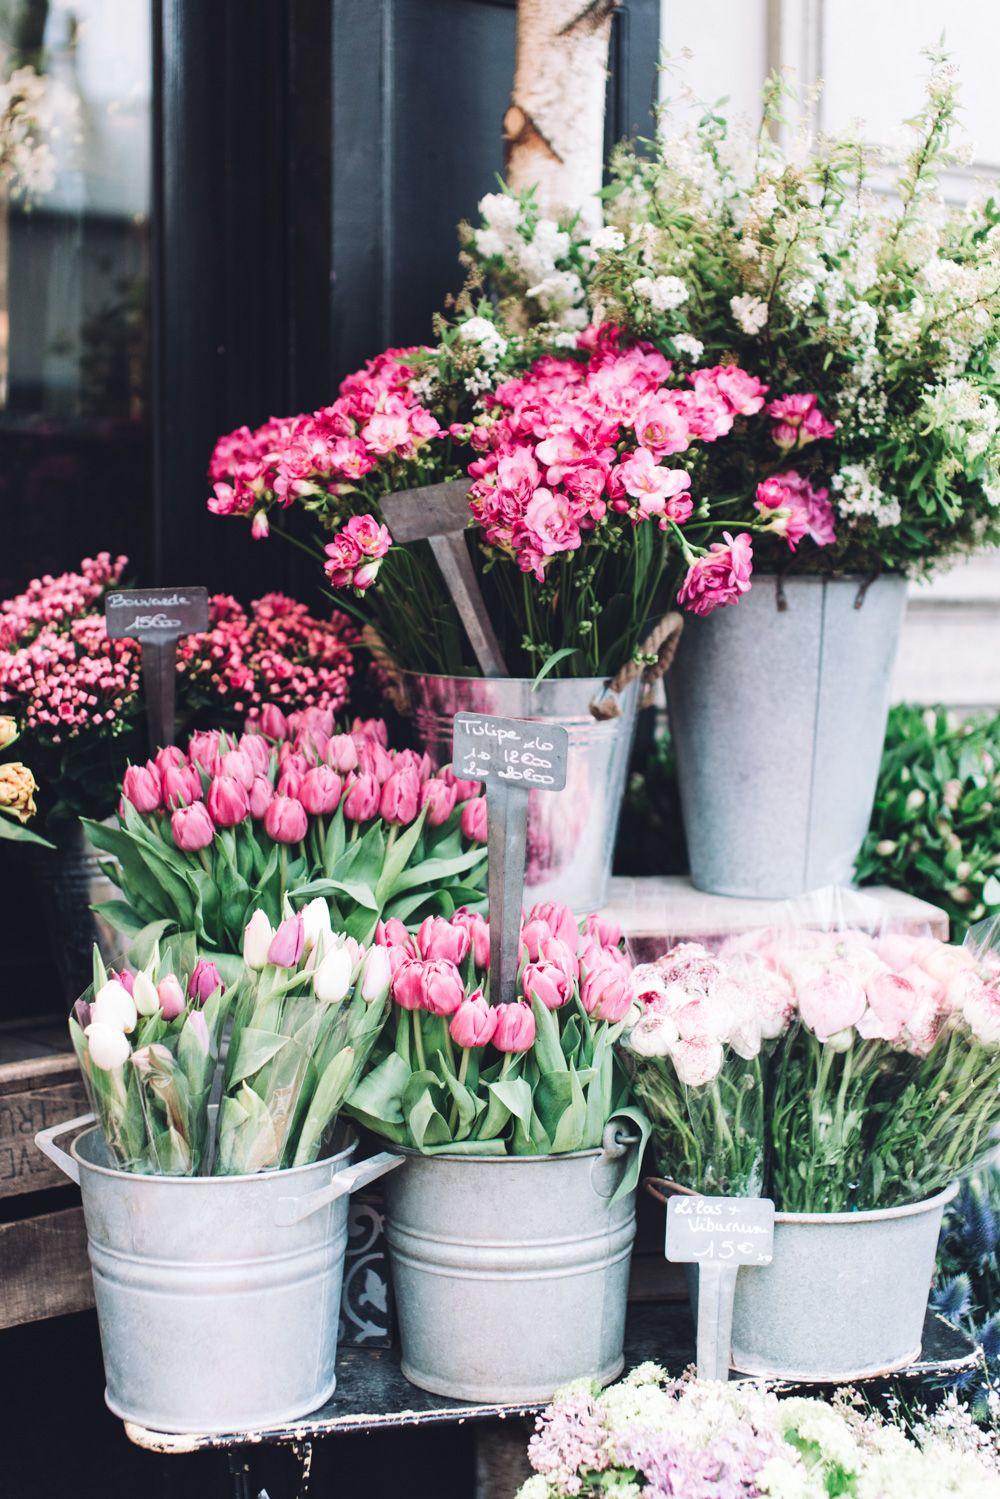 8 rue caffarelliris france pinterest simple pleasures flowers simple pleasures no izmirmasajfo Gallery